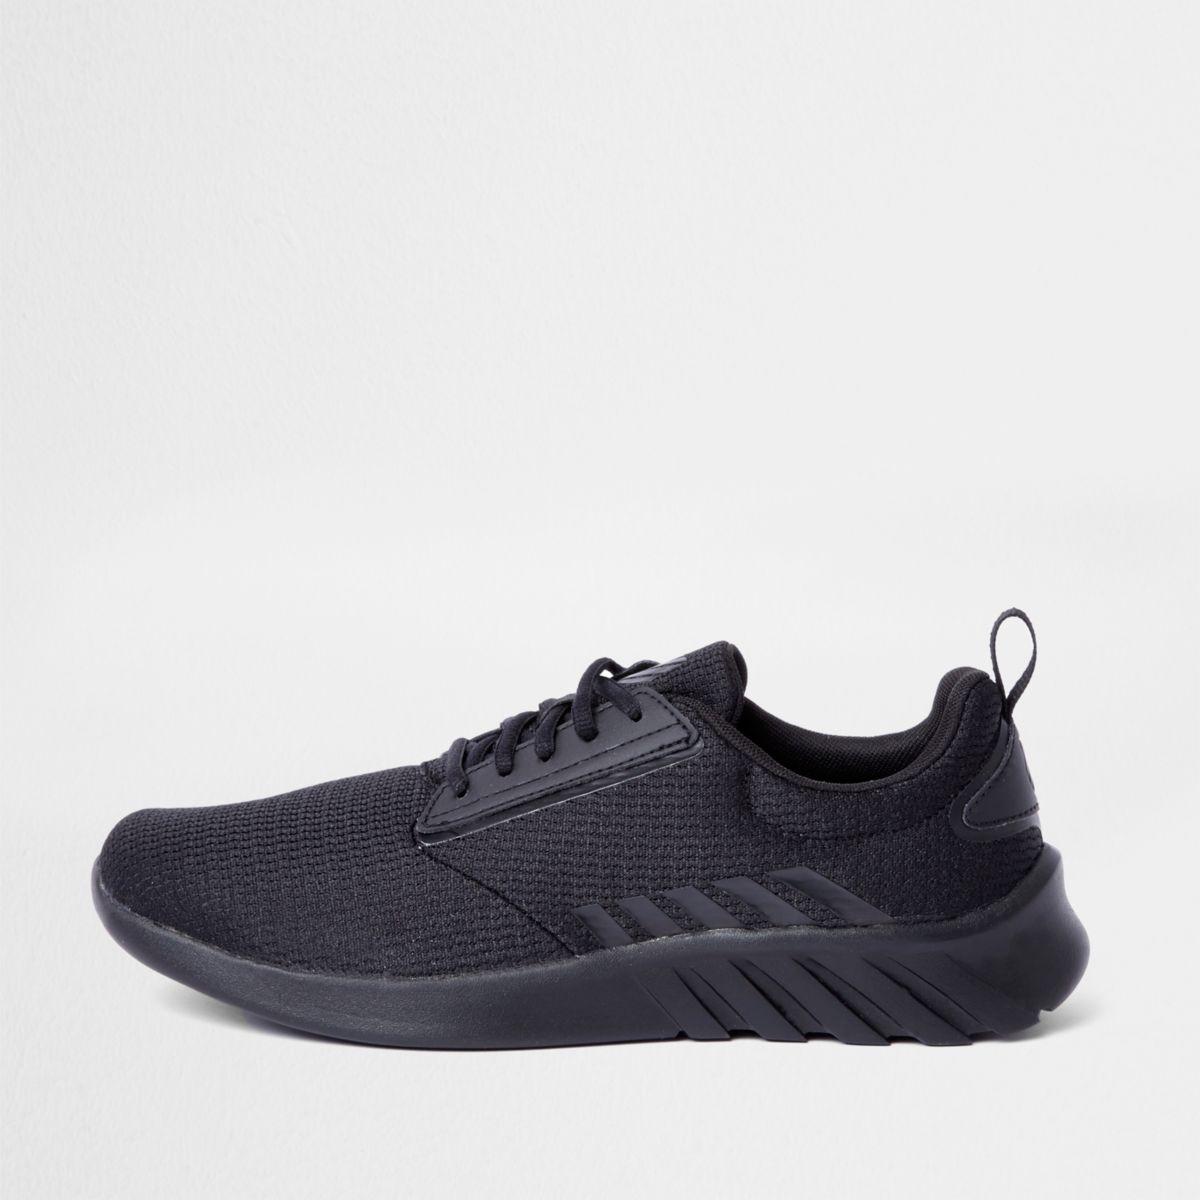 Black K-Swiss mesh sports runner sneakers